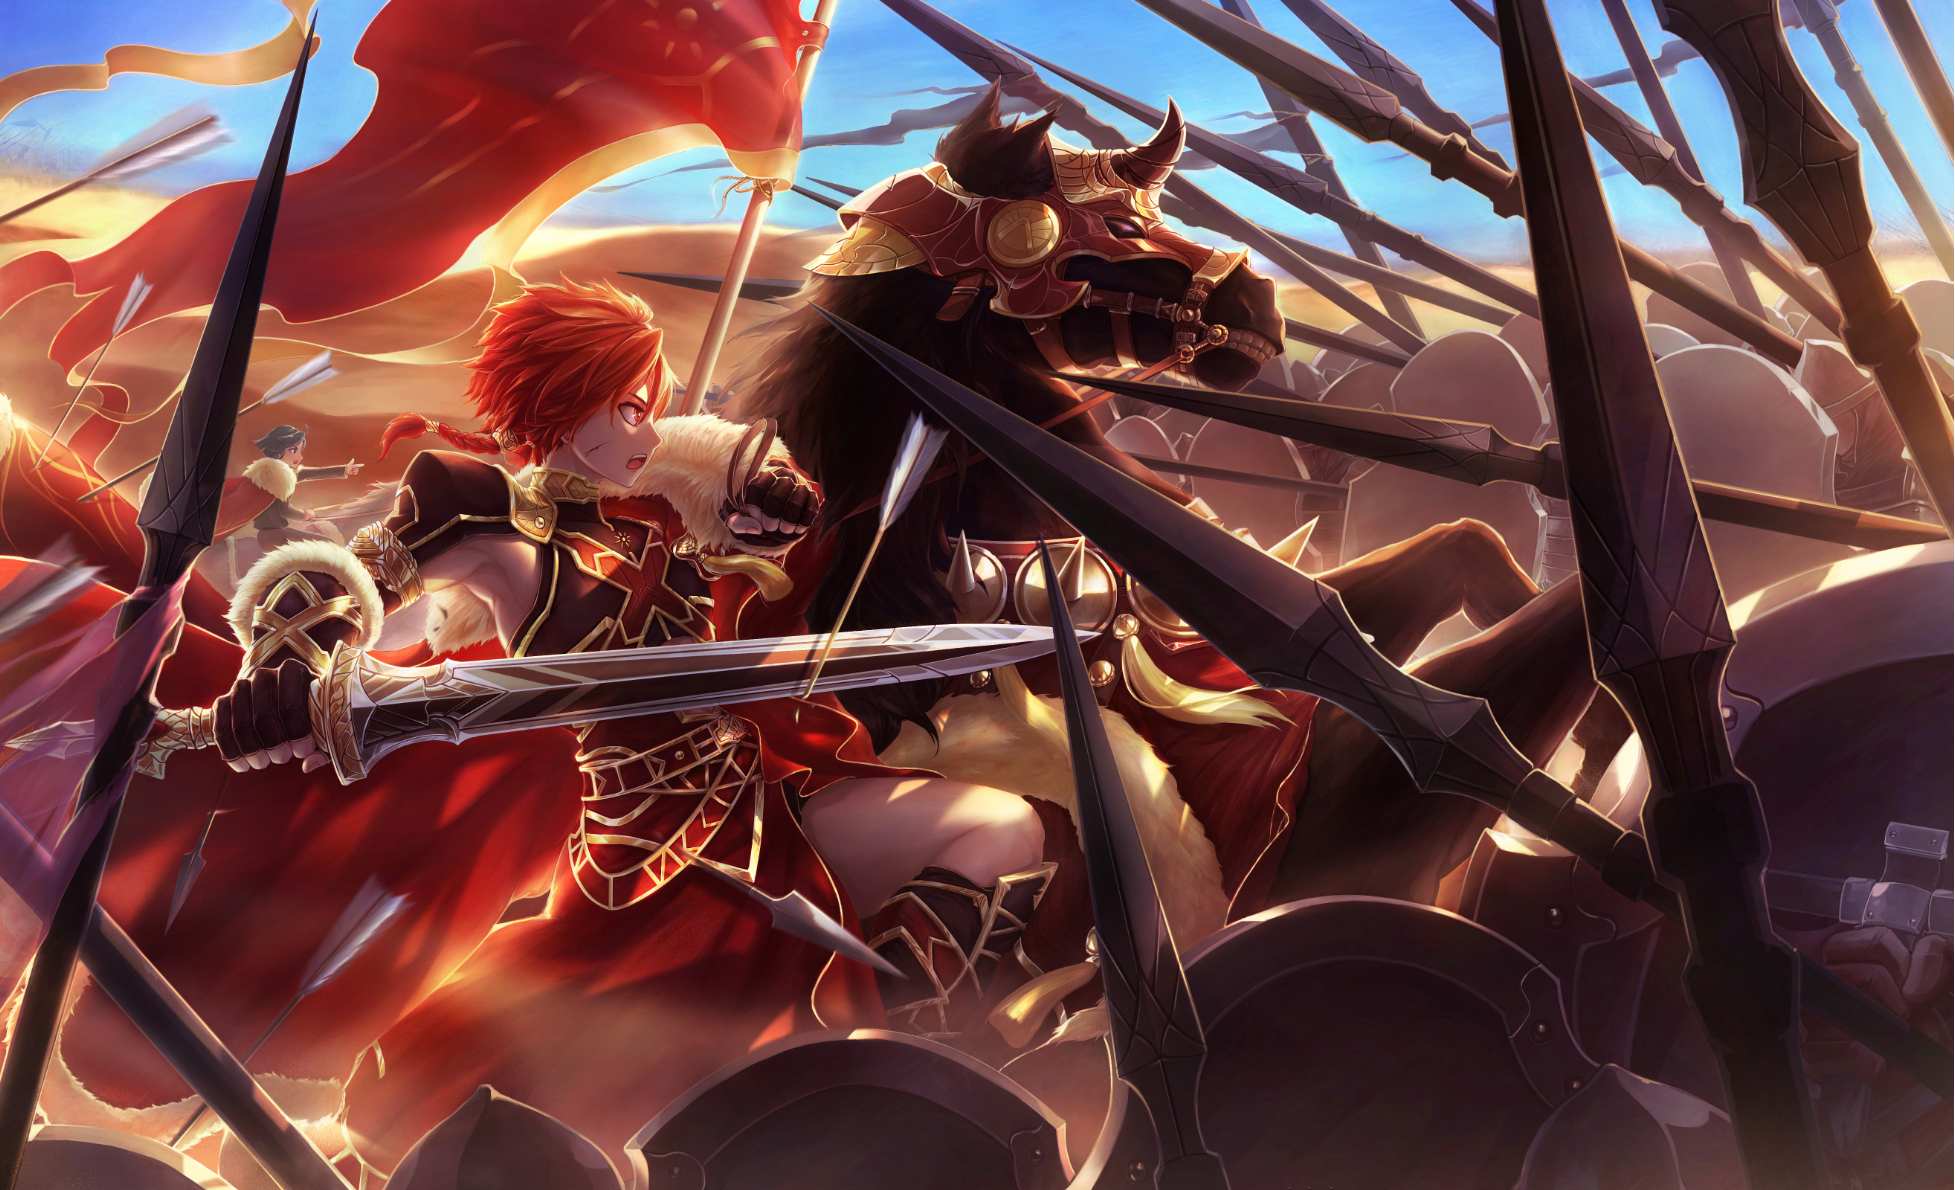 Fate Grand Order Wallpaper 2122302 Zerochan Anime Image Board